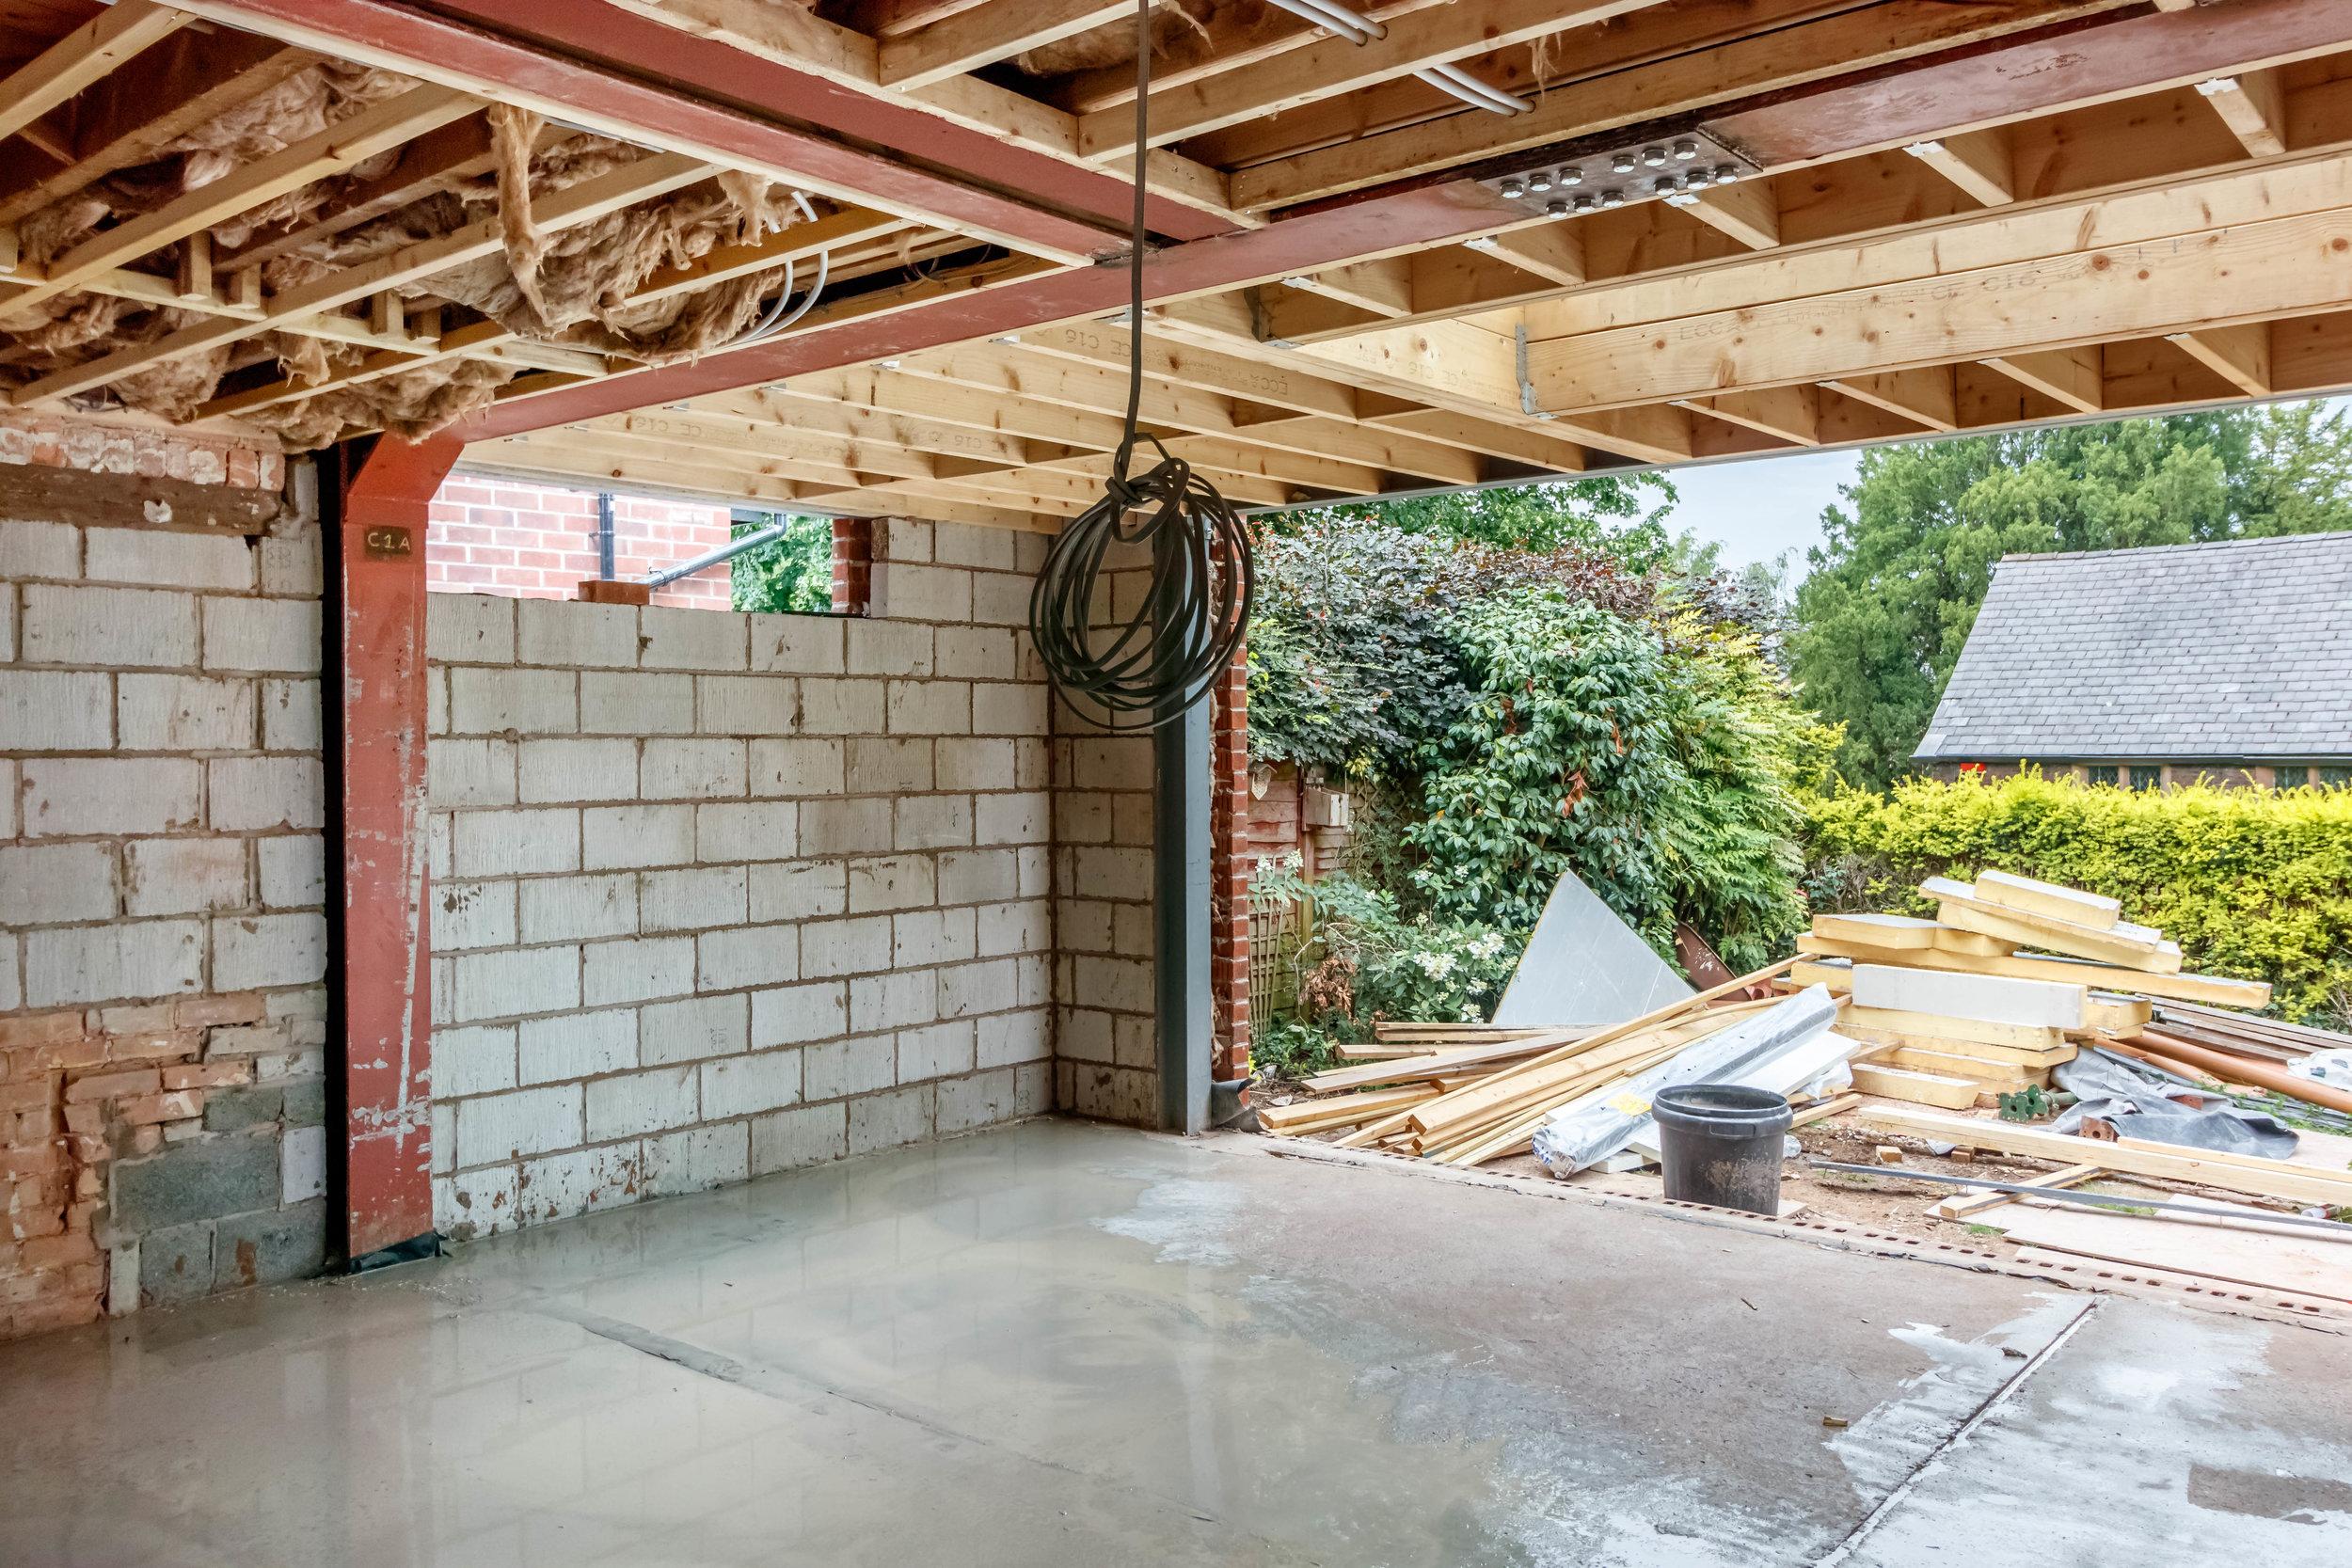 PropertyPhotographs 05179.jpg